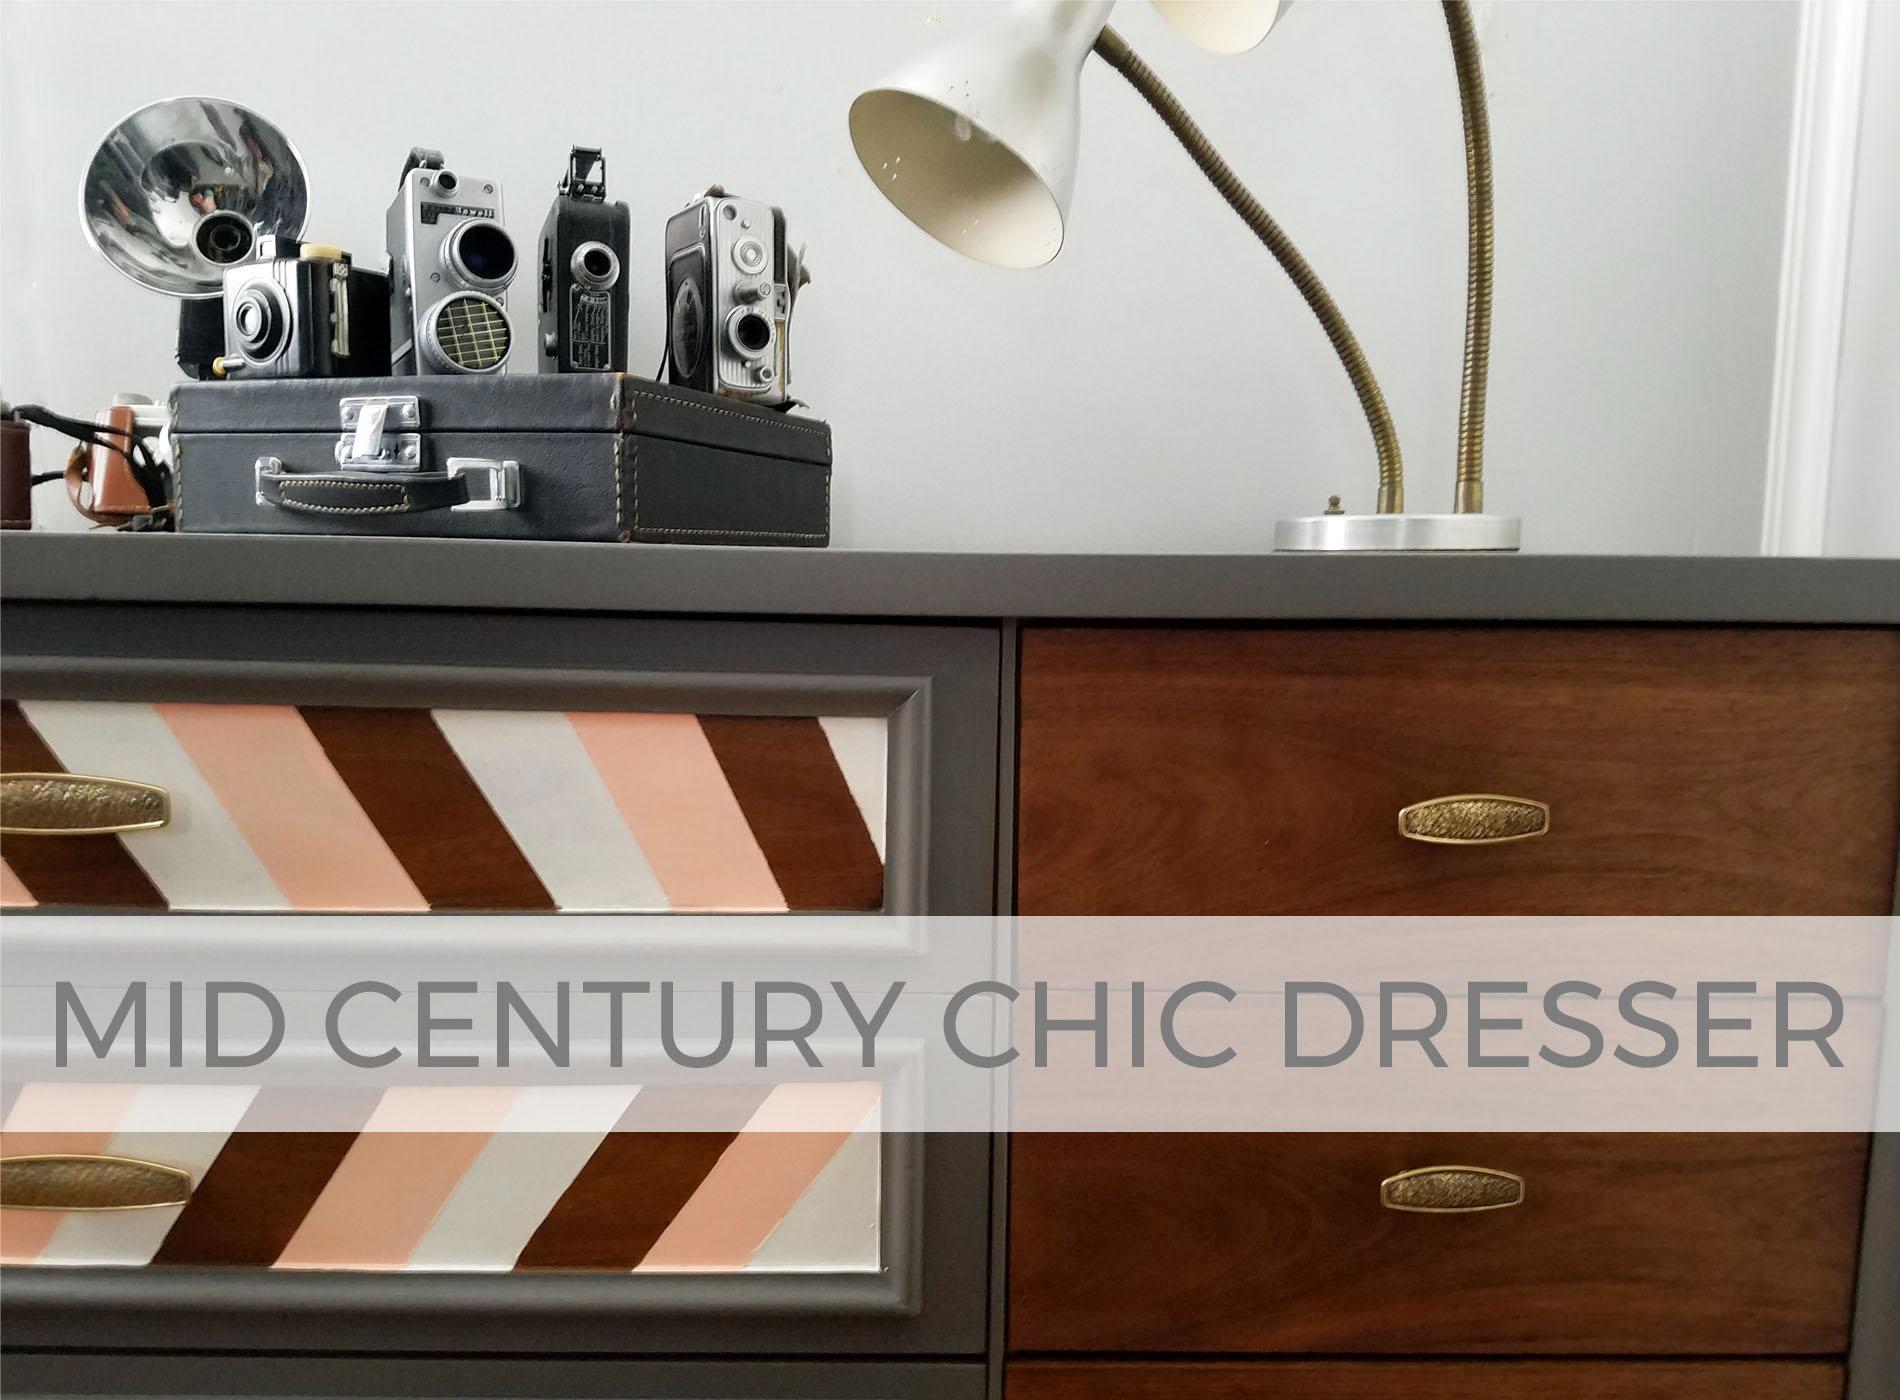 Mid Century Chic Dresser by Larissa of Prodigal Pieces | prodigalpieces.com